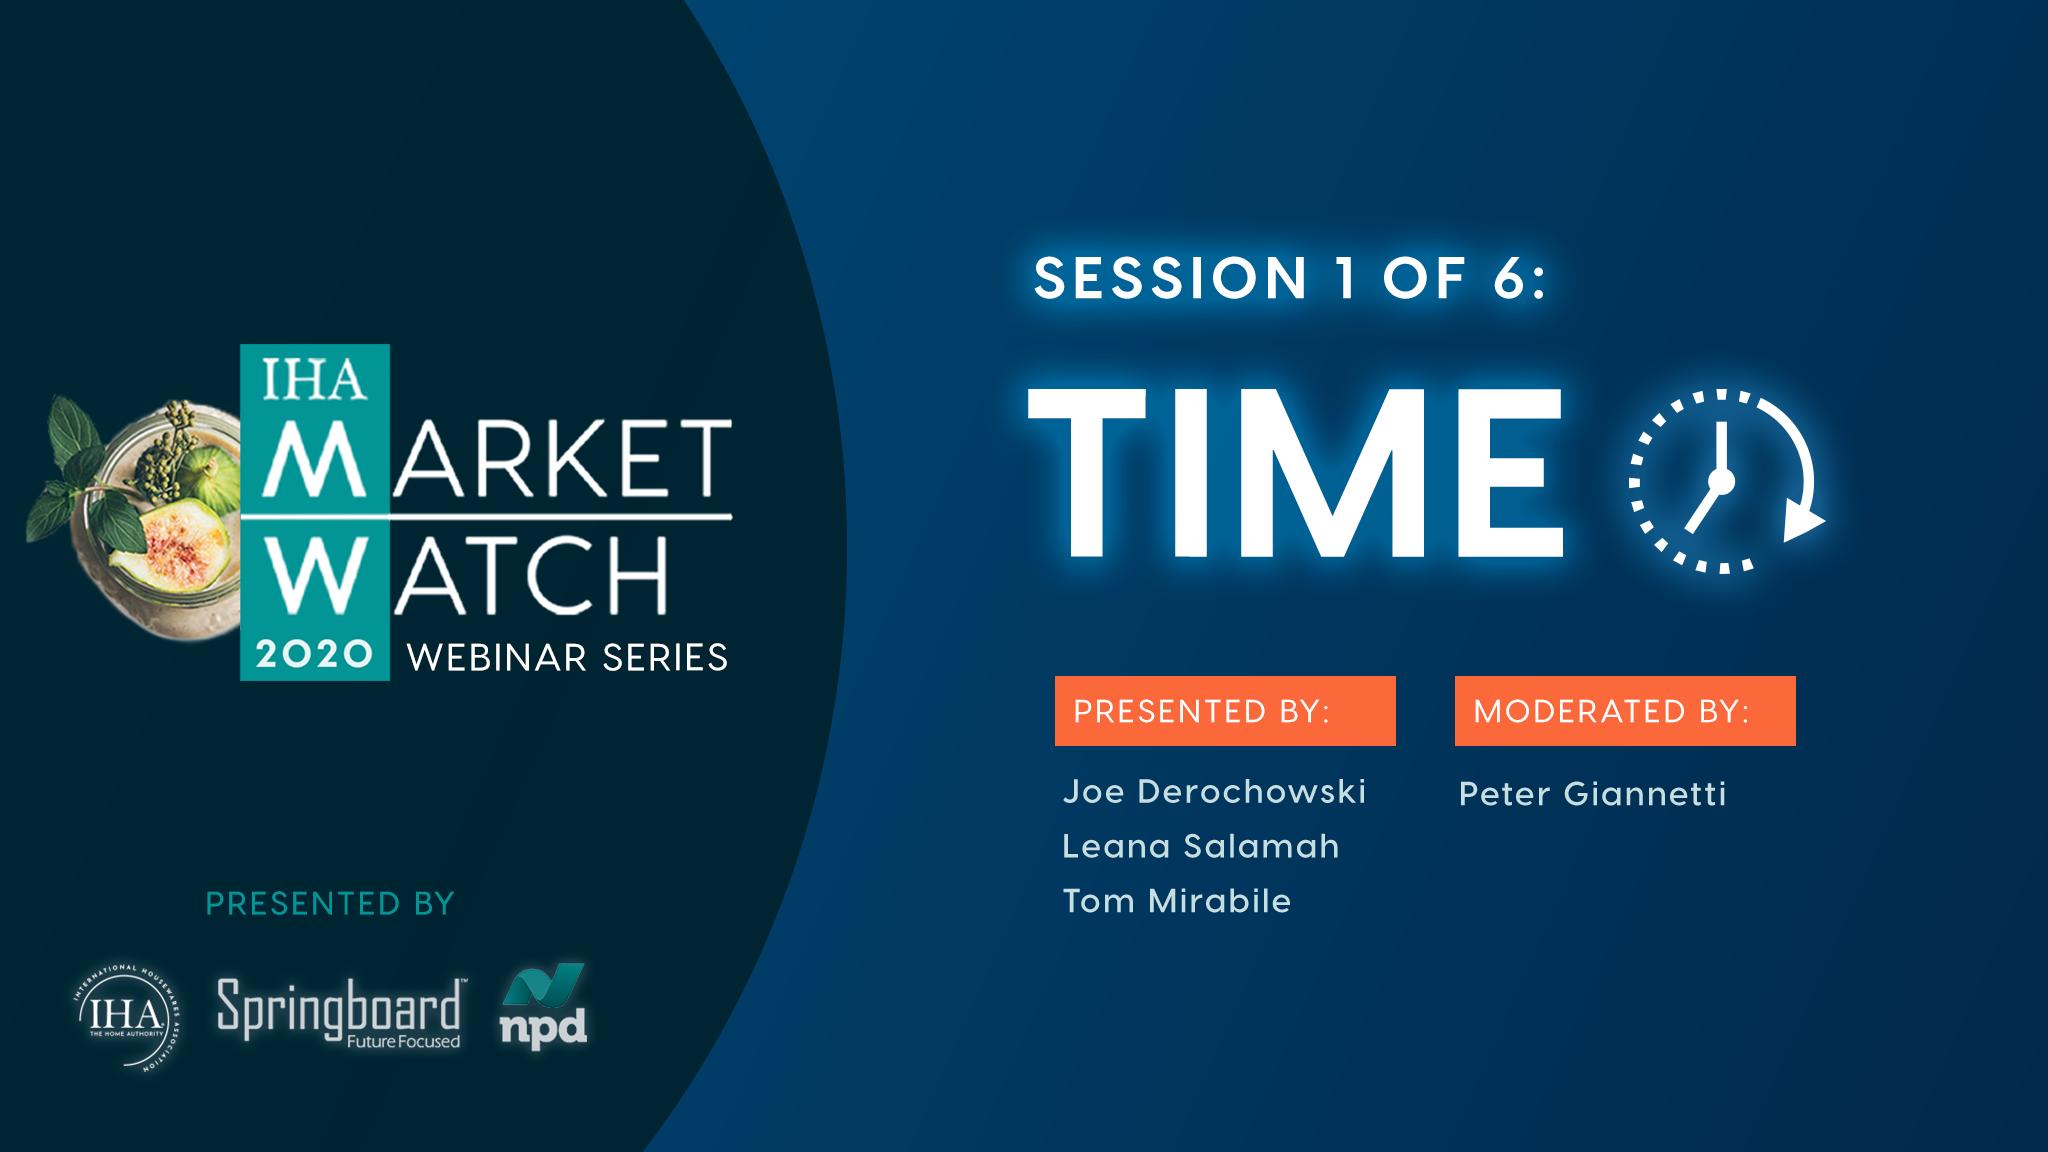 IHA Market Watch - Session 1 - Time